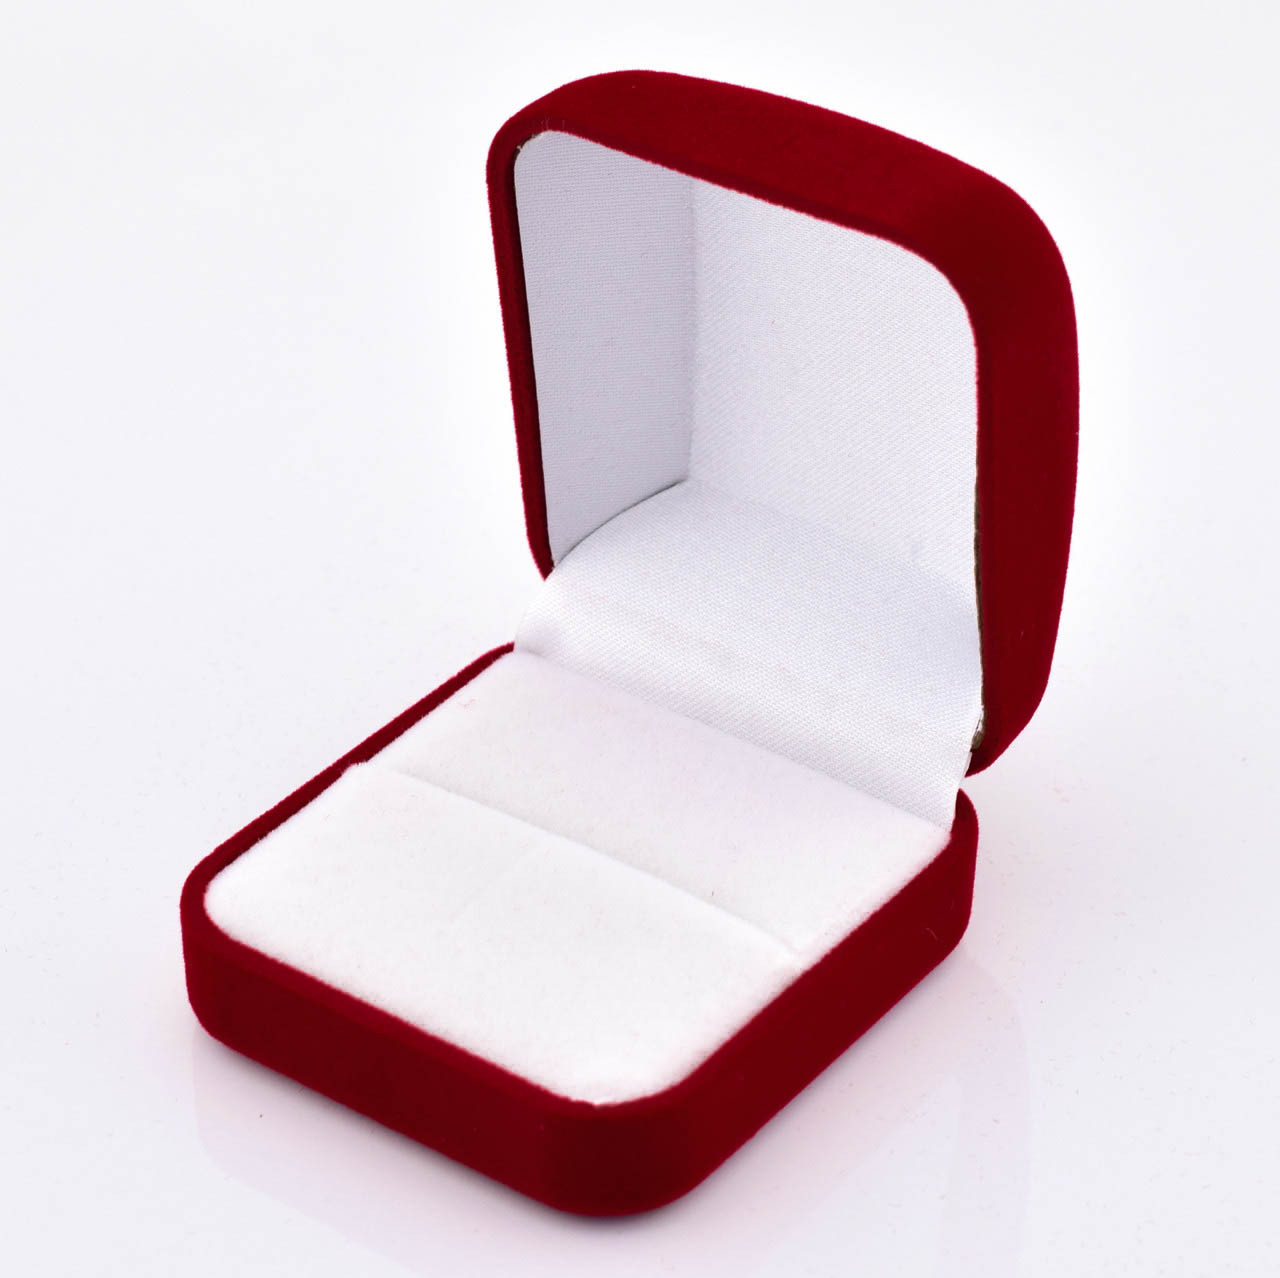 Футляр классика для кольца, бордовый бархат, 53676 размер 5.3*5.8 см